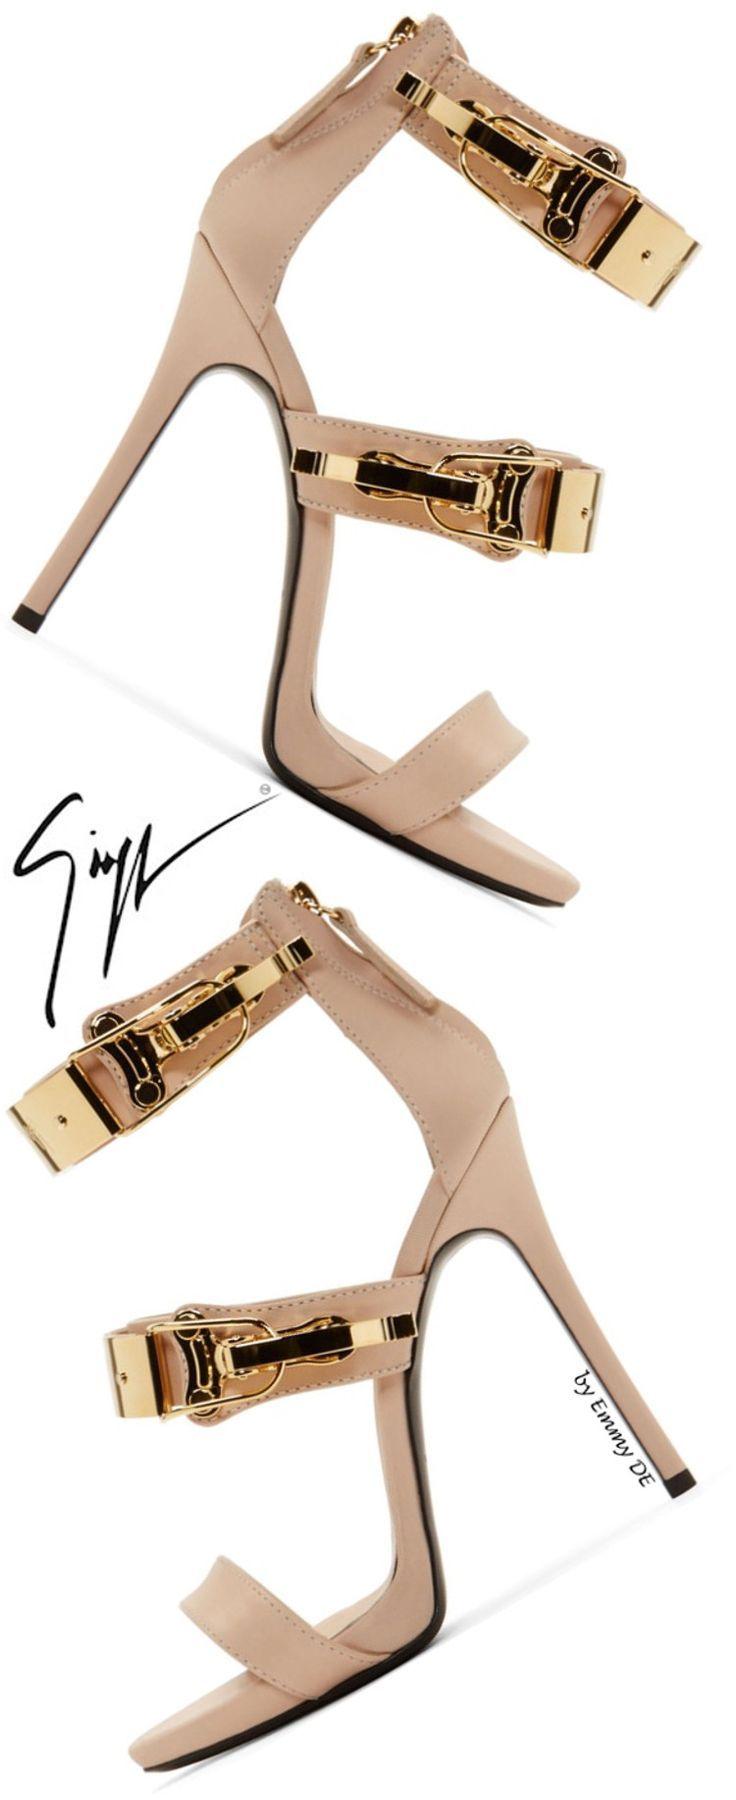 Giuseppe Zanotti Nude Pink Leather Coline Stiletto Sandals  |  @ giuseppe  zanotti